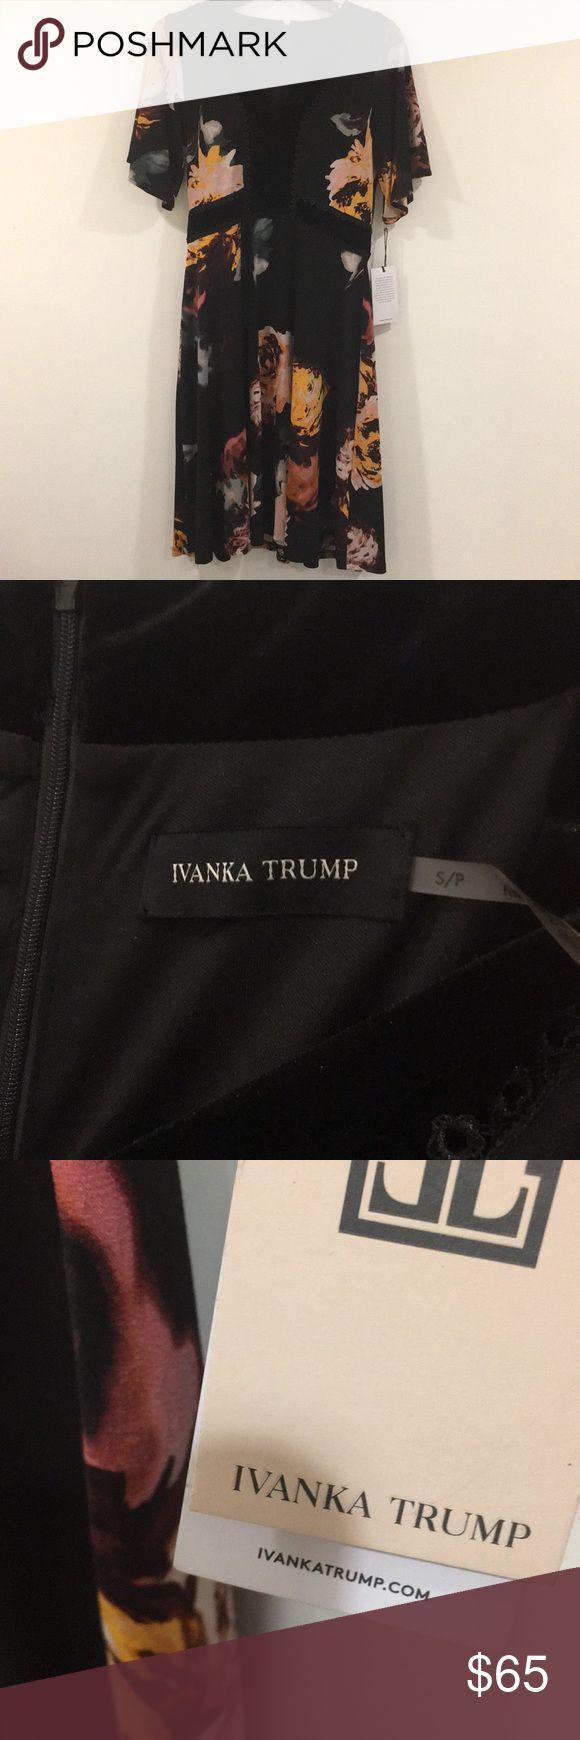 Ivanka Trump Dress Size S Ivanka Trump Dress Size S Ivanka Trump Dresses